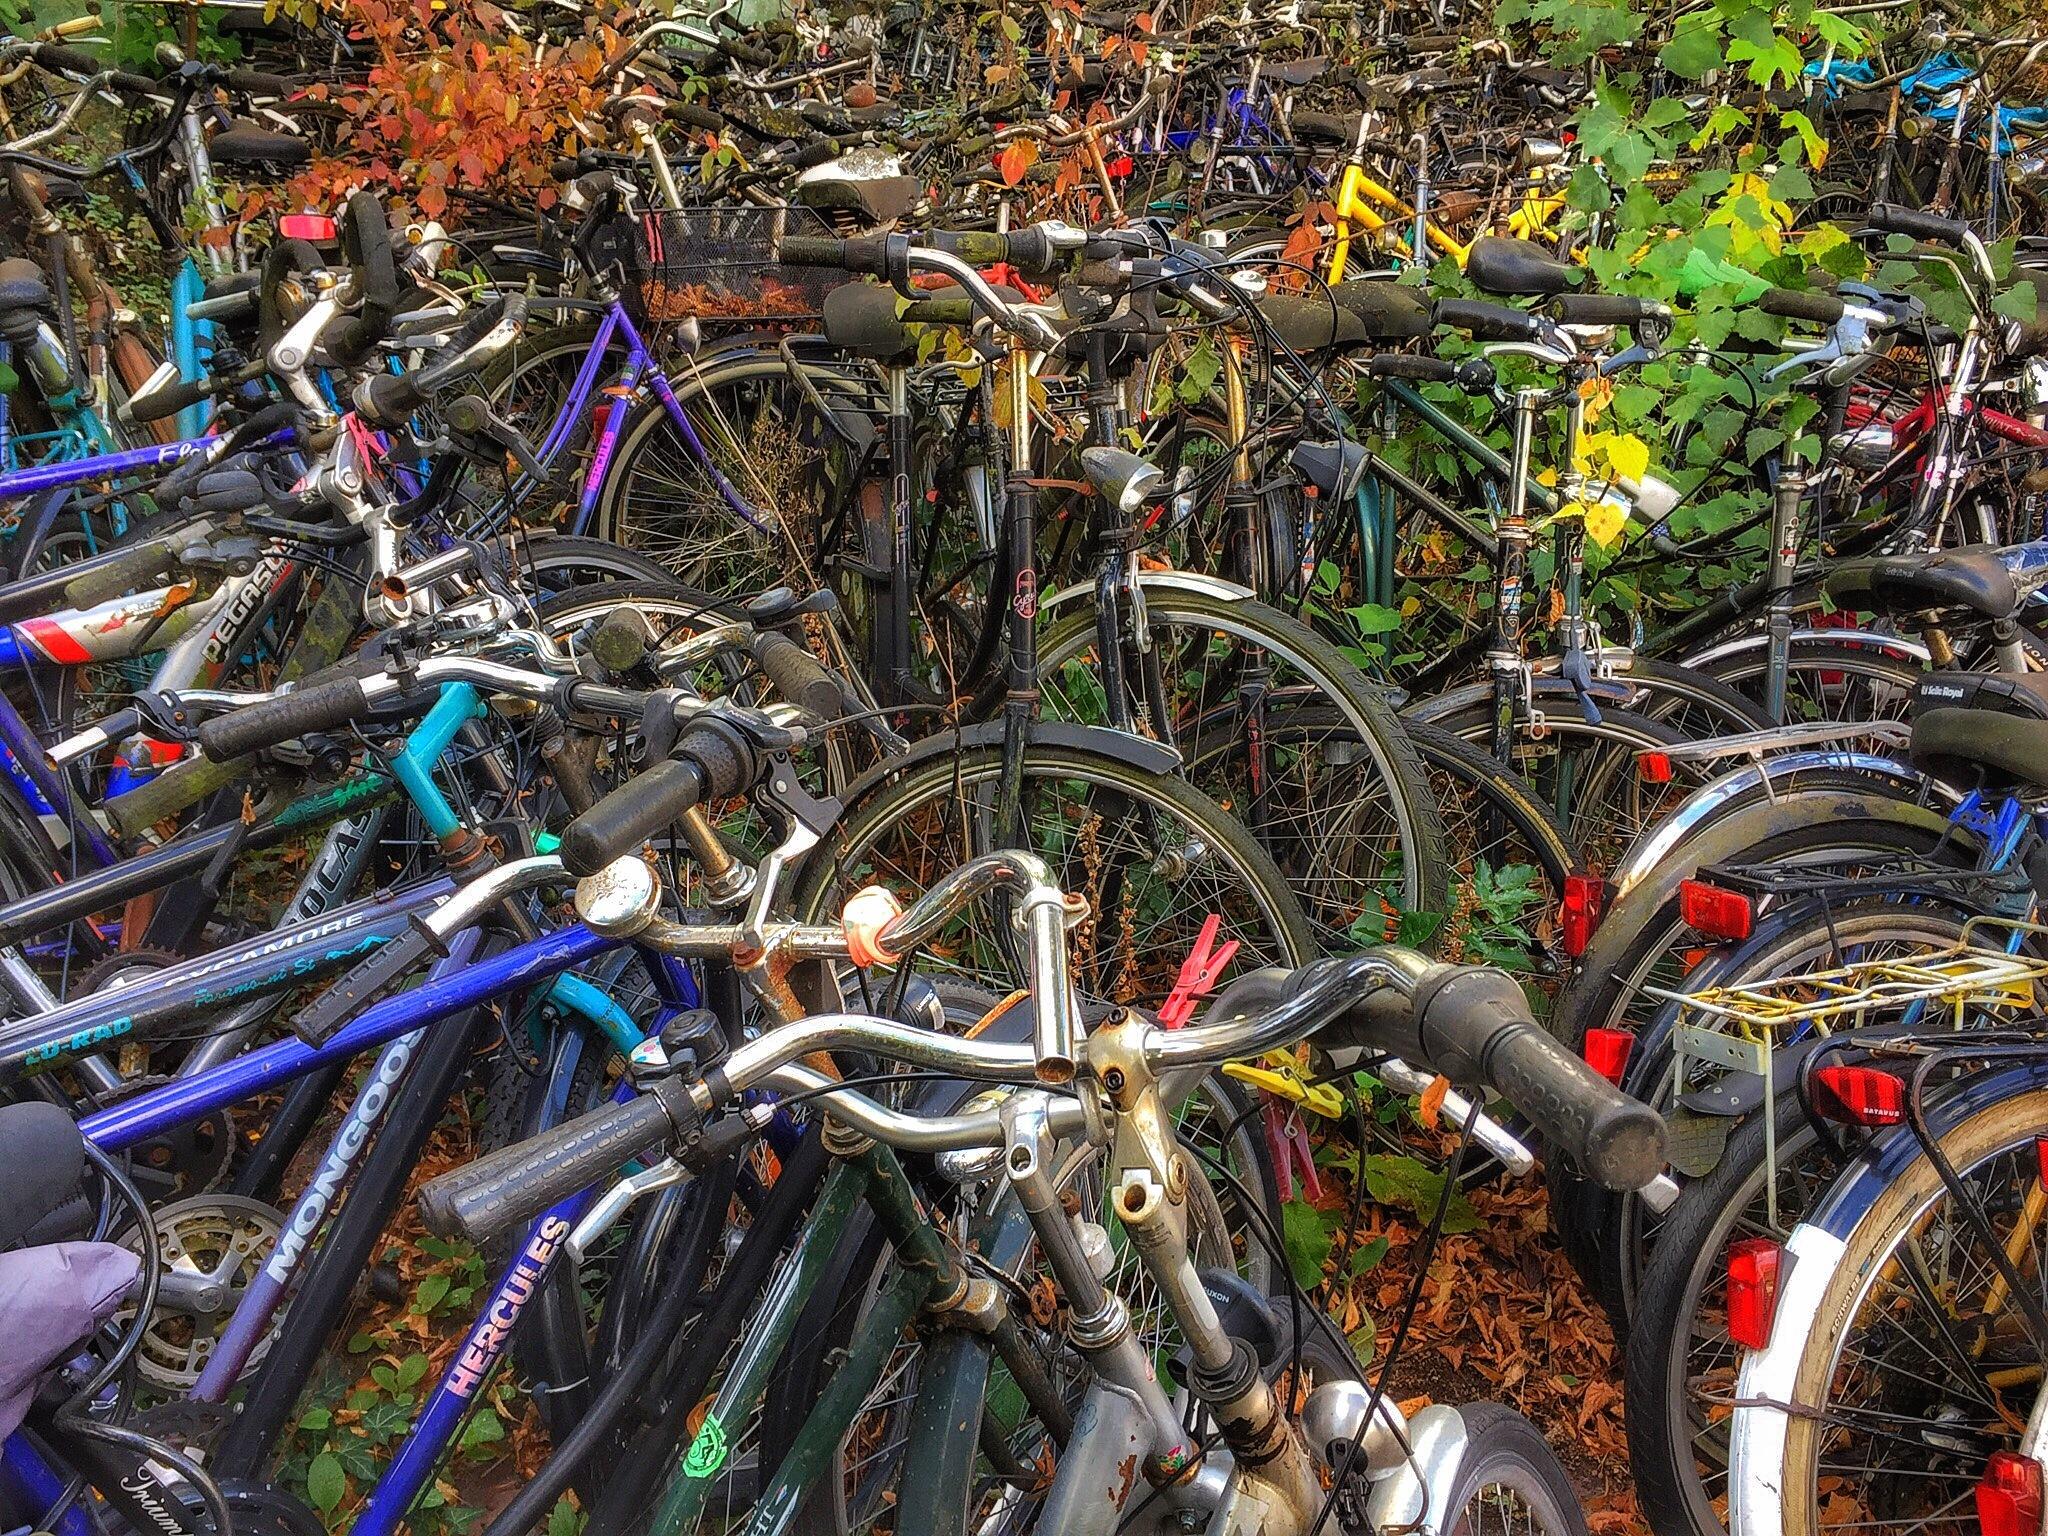 Fahrradfriedhof 2 by Harry Schäfer